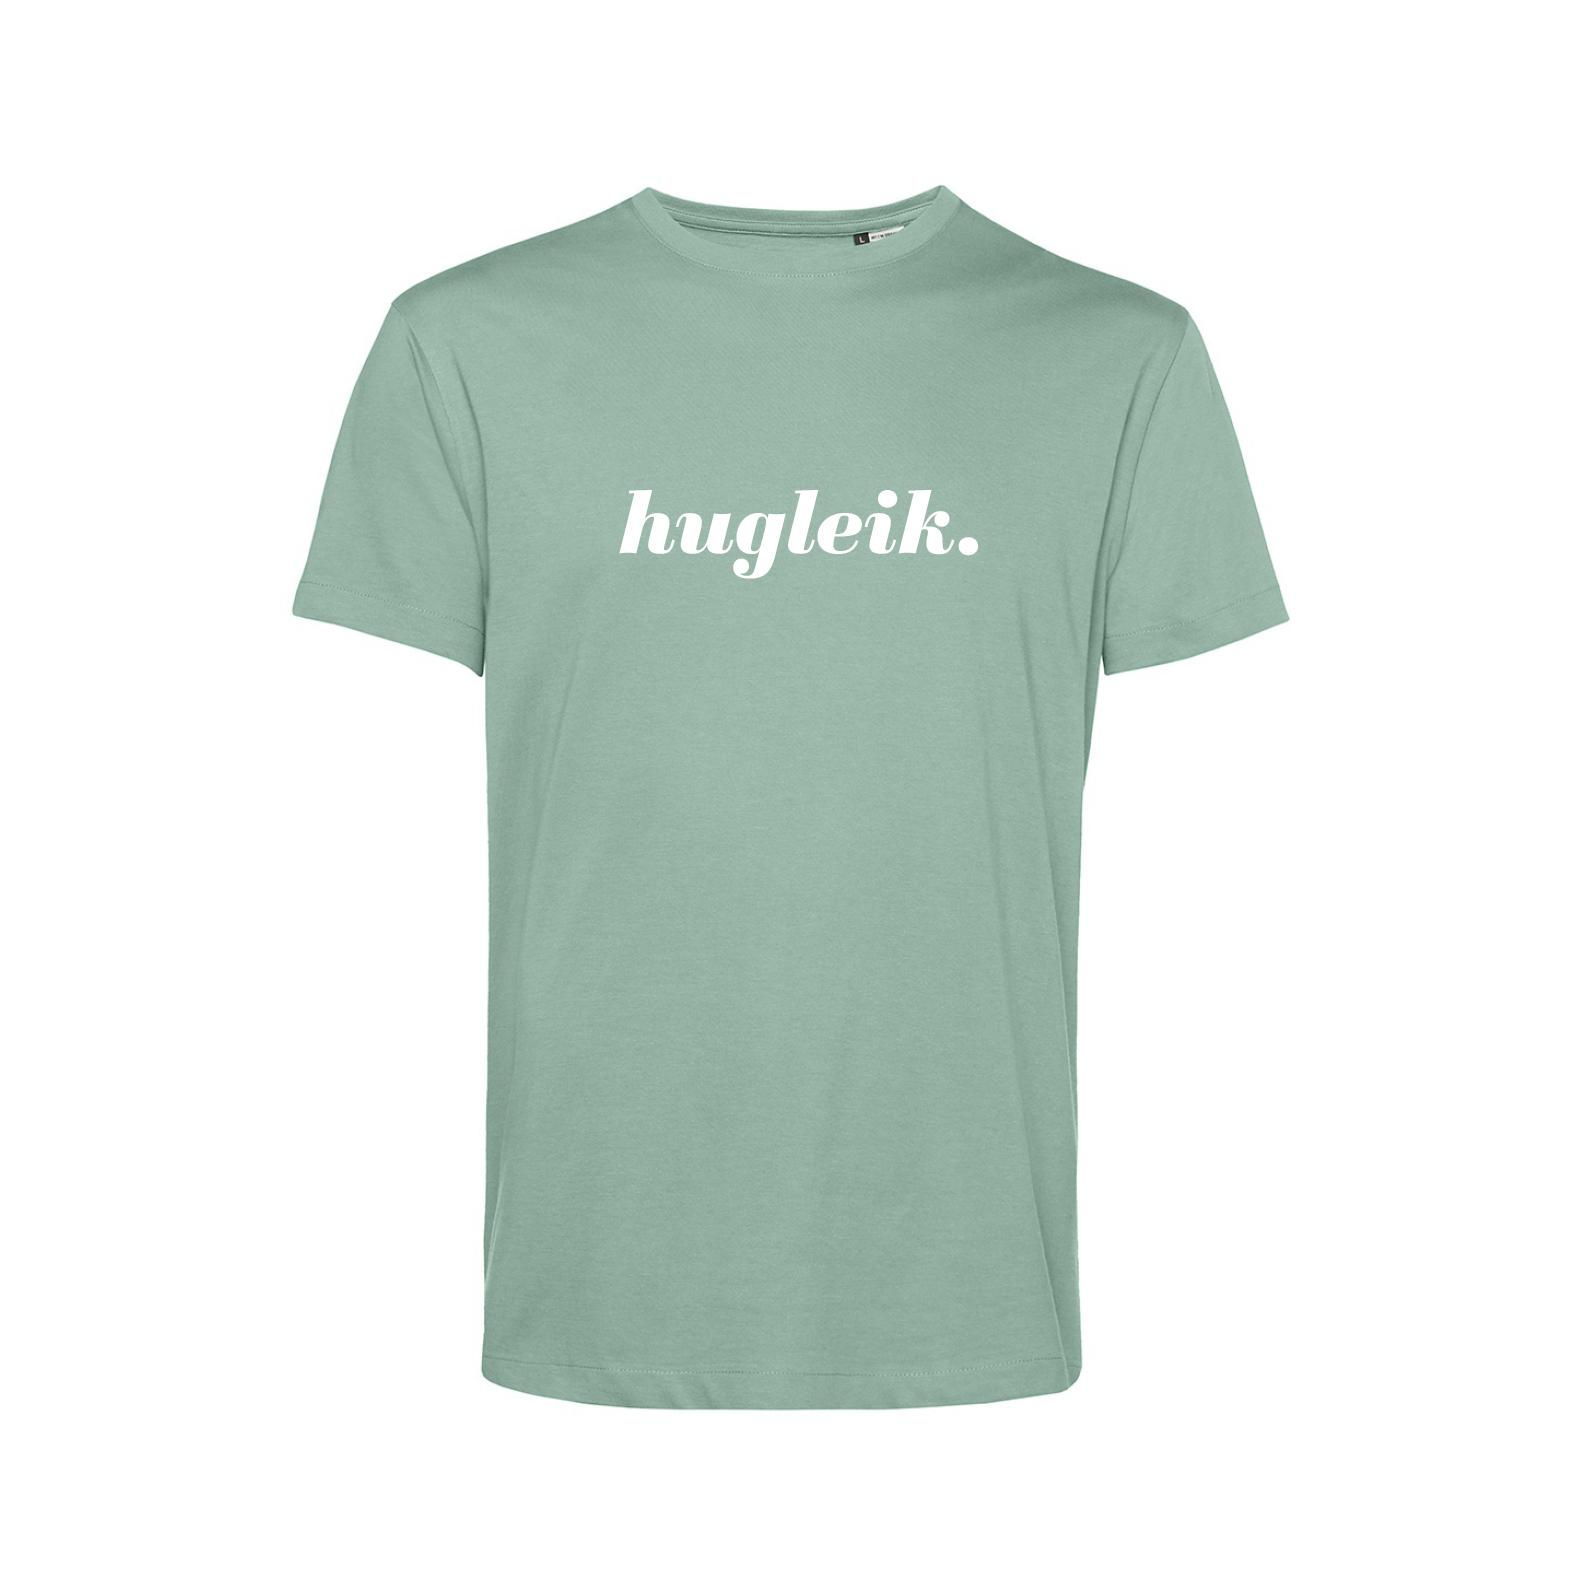 Dus grøn t-skjorte